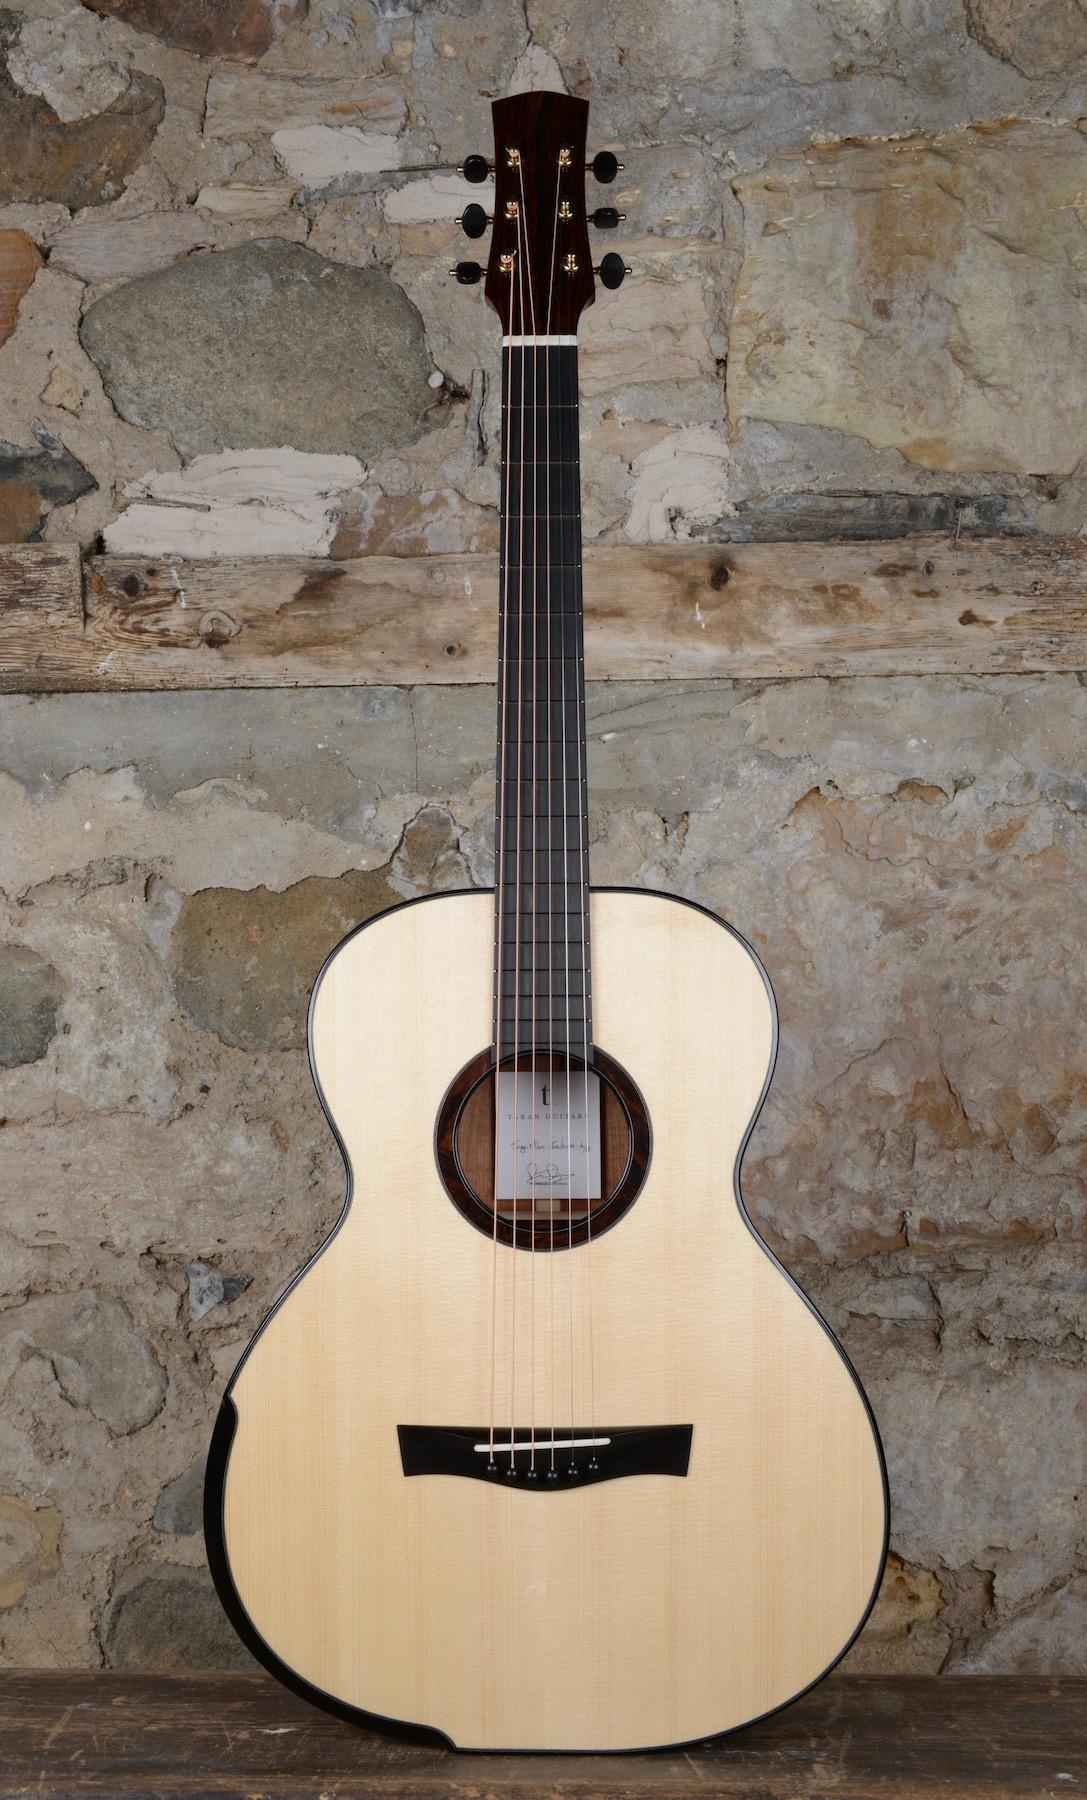 Copy of Taran Guitars Tirga Mhor Tasmanian Blackwood